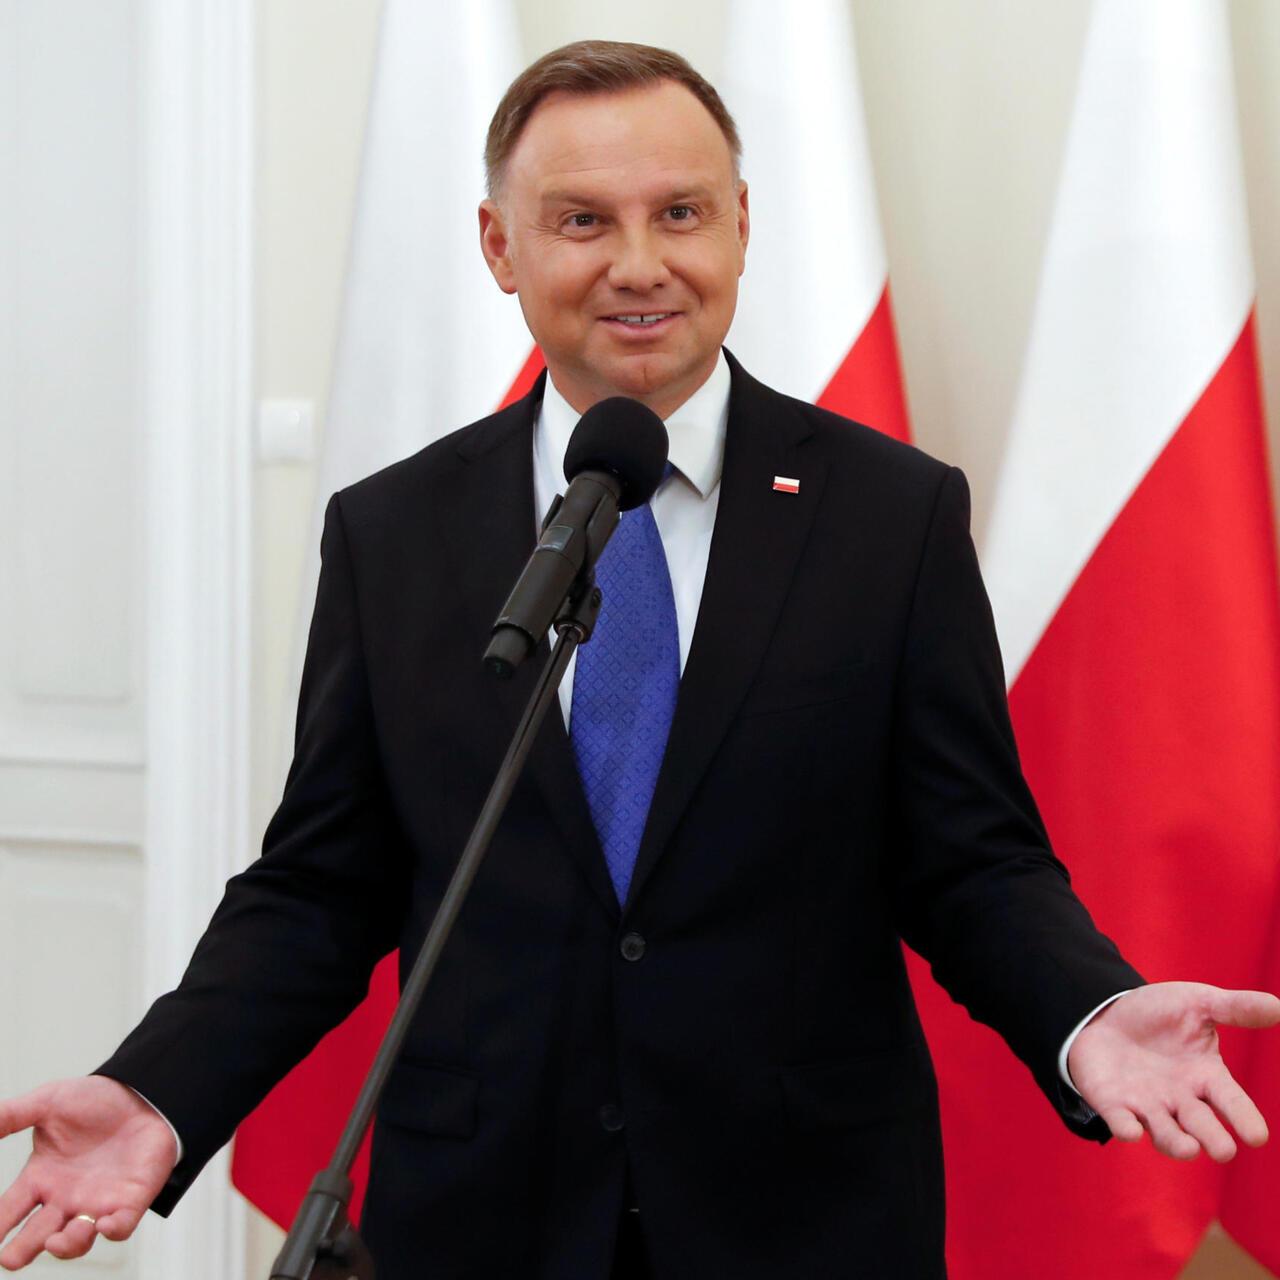 Polish President Andrzej Duda Wins Re Election